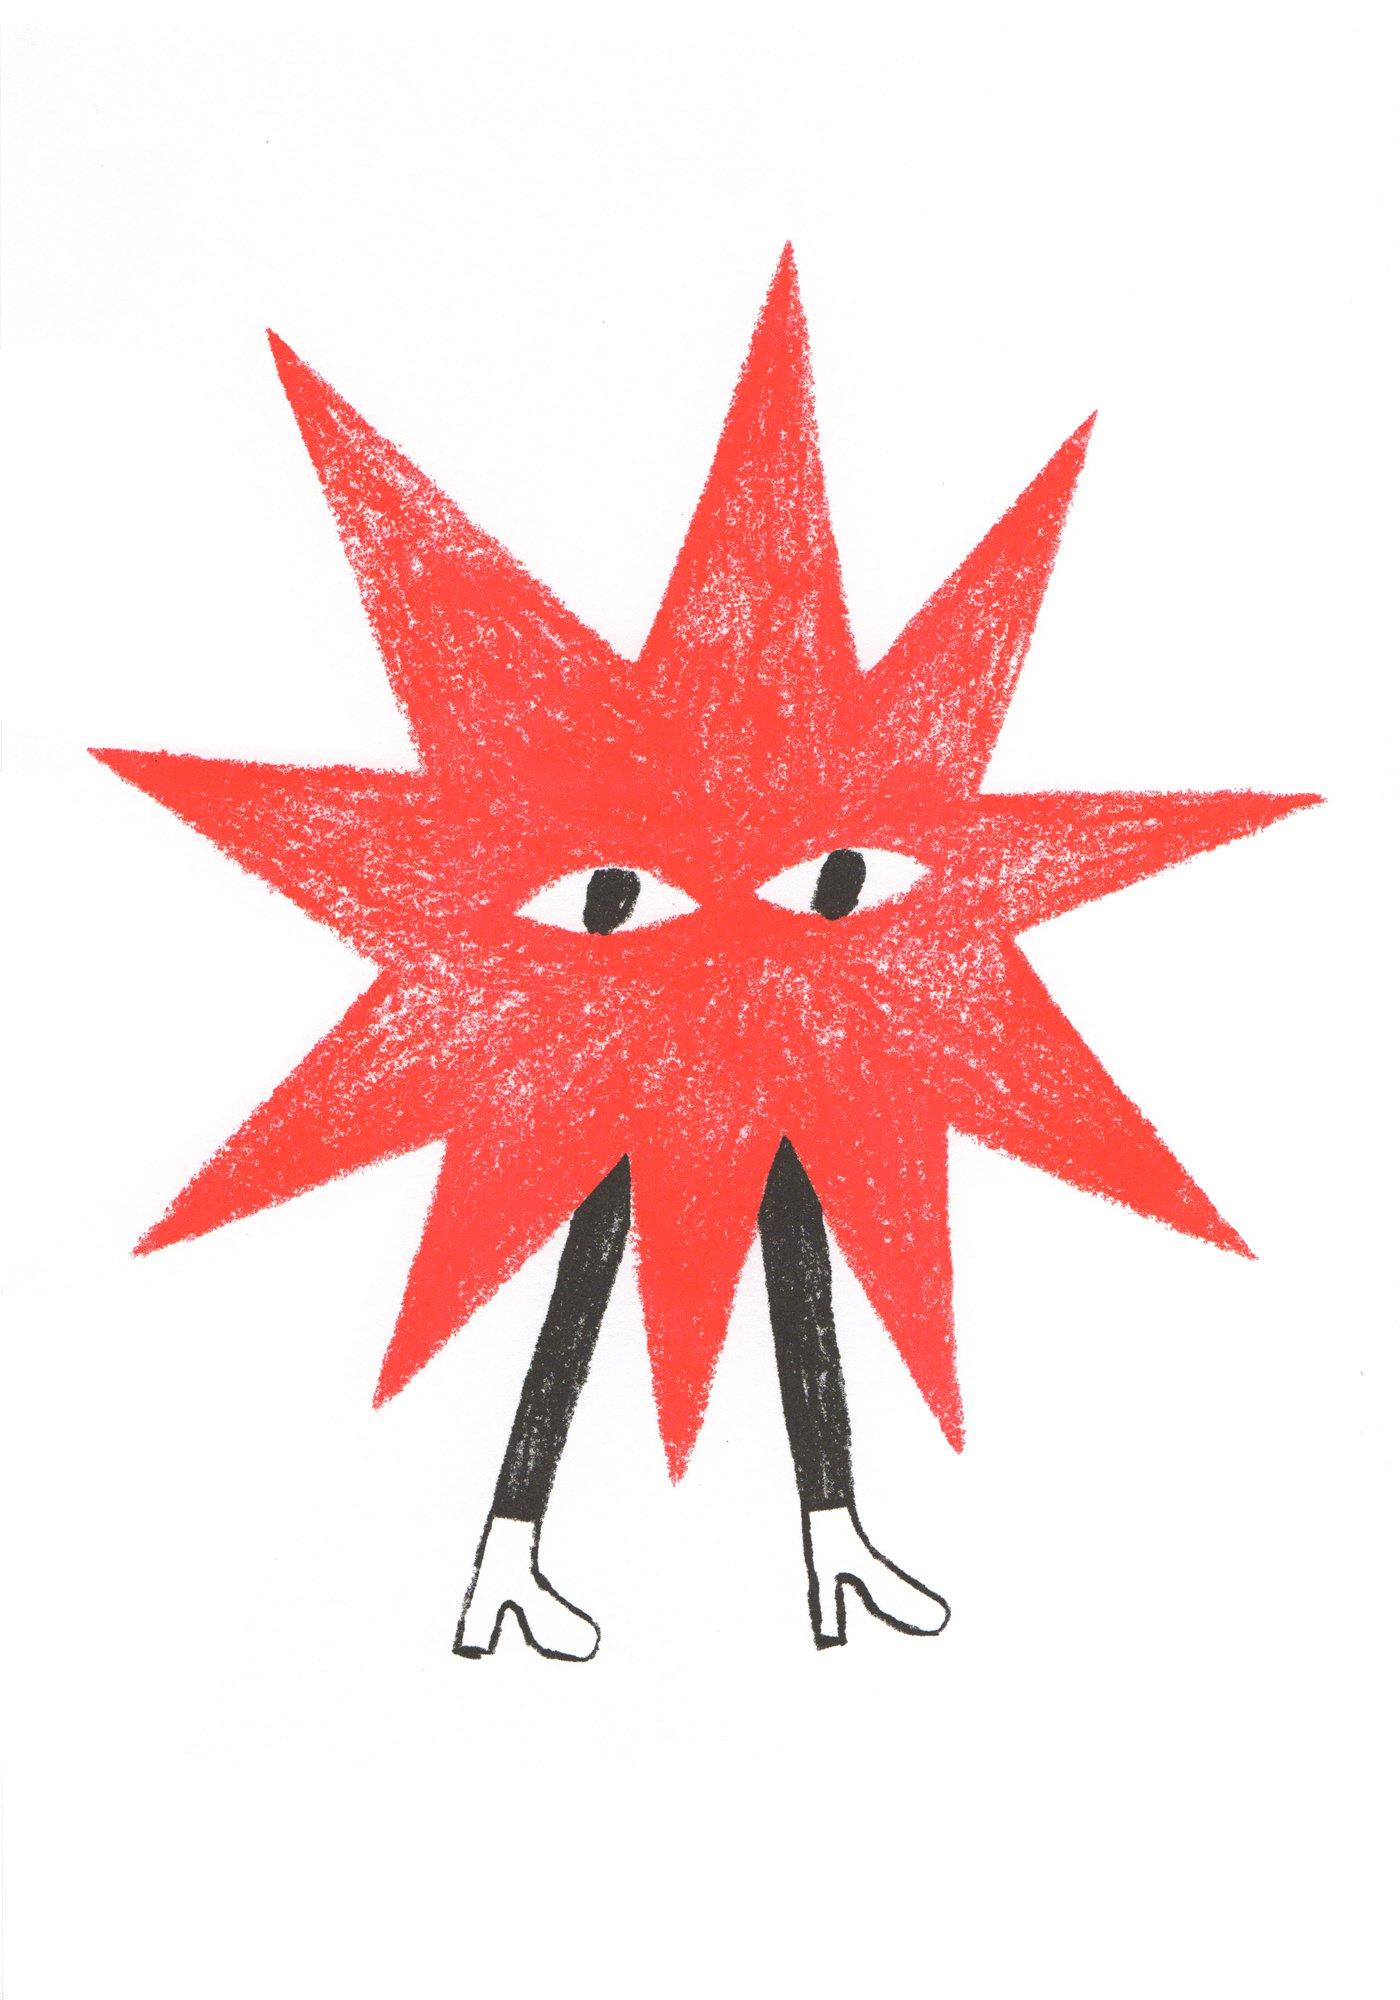 Image of Firecracker